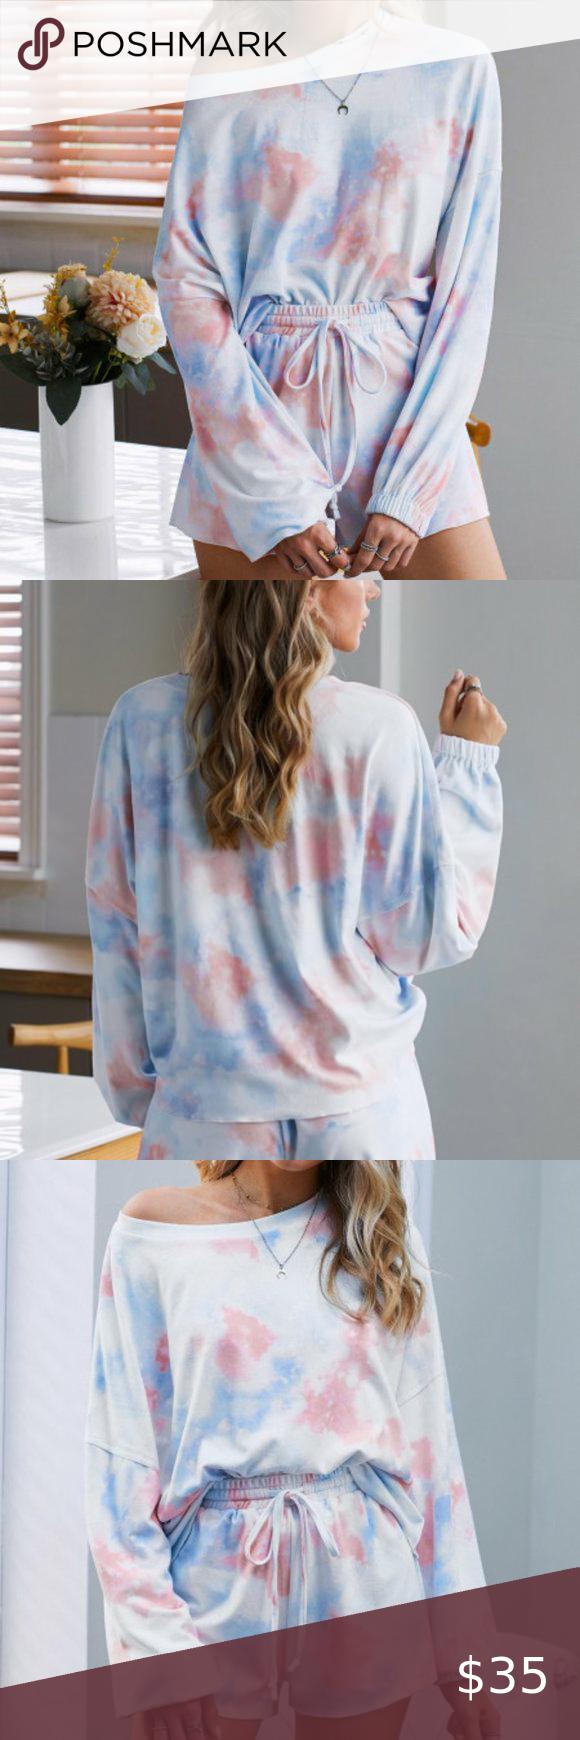 So Comfy Tie Dye Pullover Top So Comfy Tie Dye Pullover Top Us 8 10 M Reine Tops Tees Lo Blue Long Sleeve Tops Pink Long Sleeve Tops Long Sleeve Striped Top [ 1740 x 580 Pixel ]